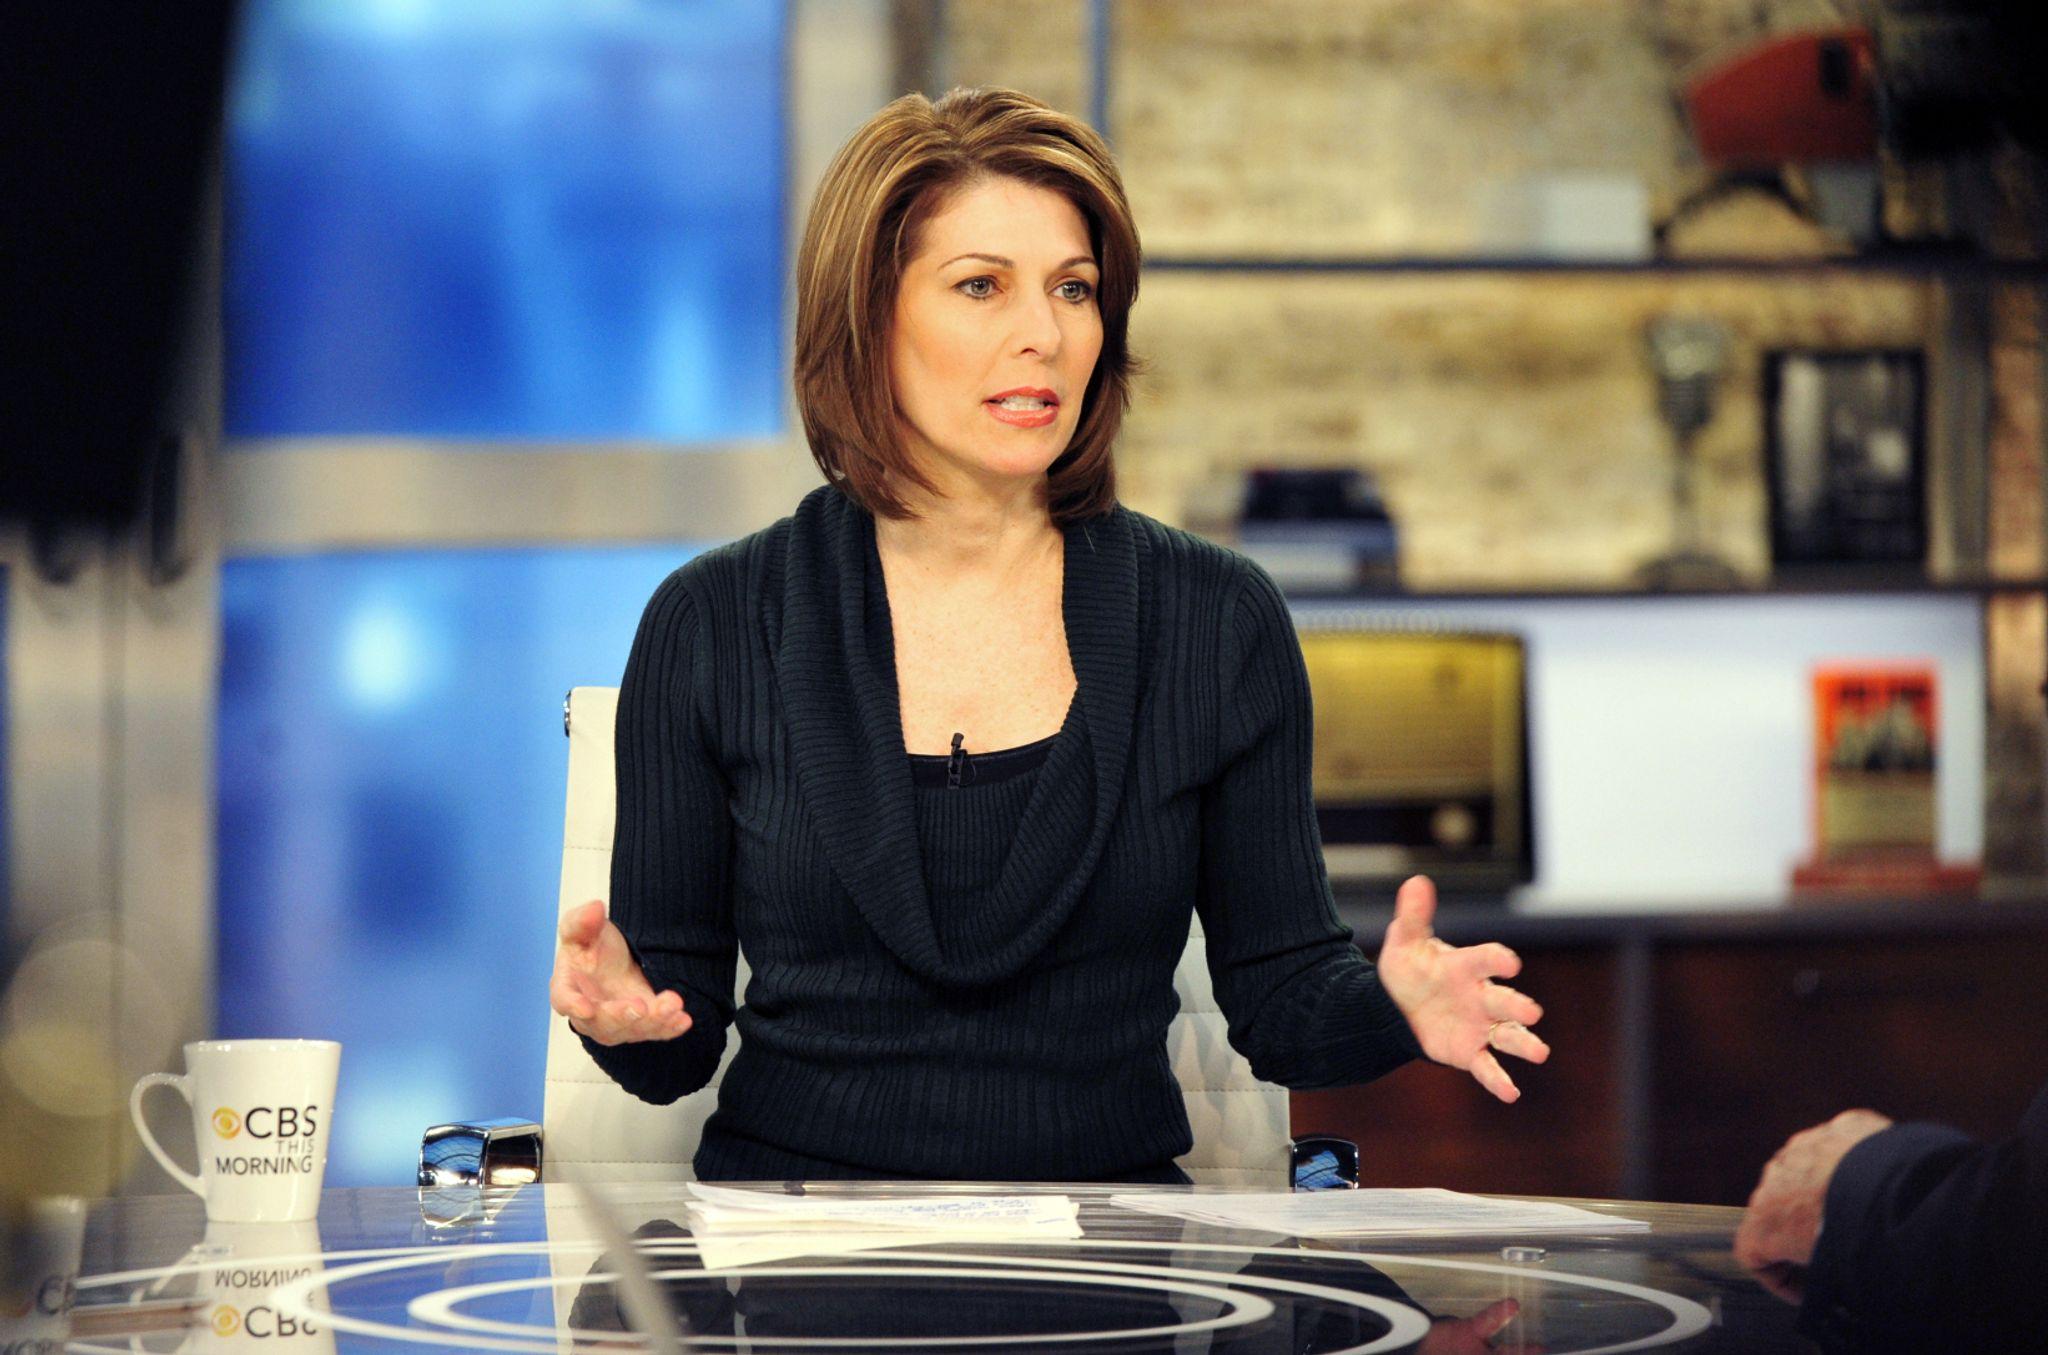 Christina Orbakayte unflatteringly spoke about the work of Irina Allegrova 20.05.2012 85